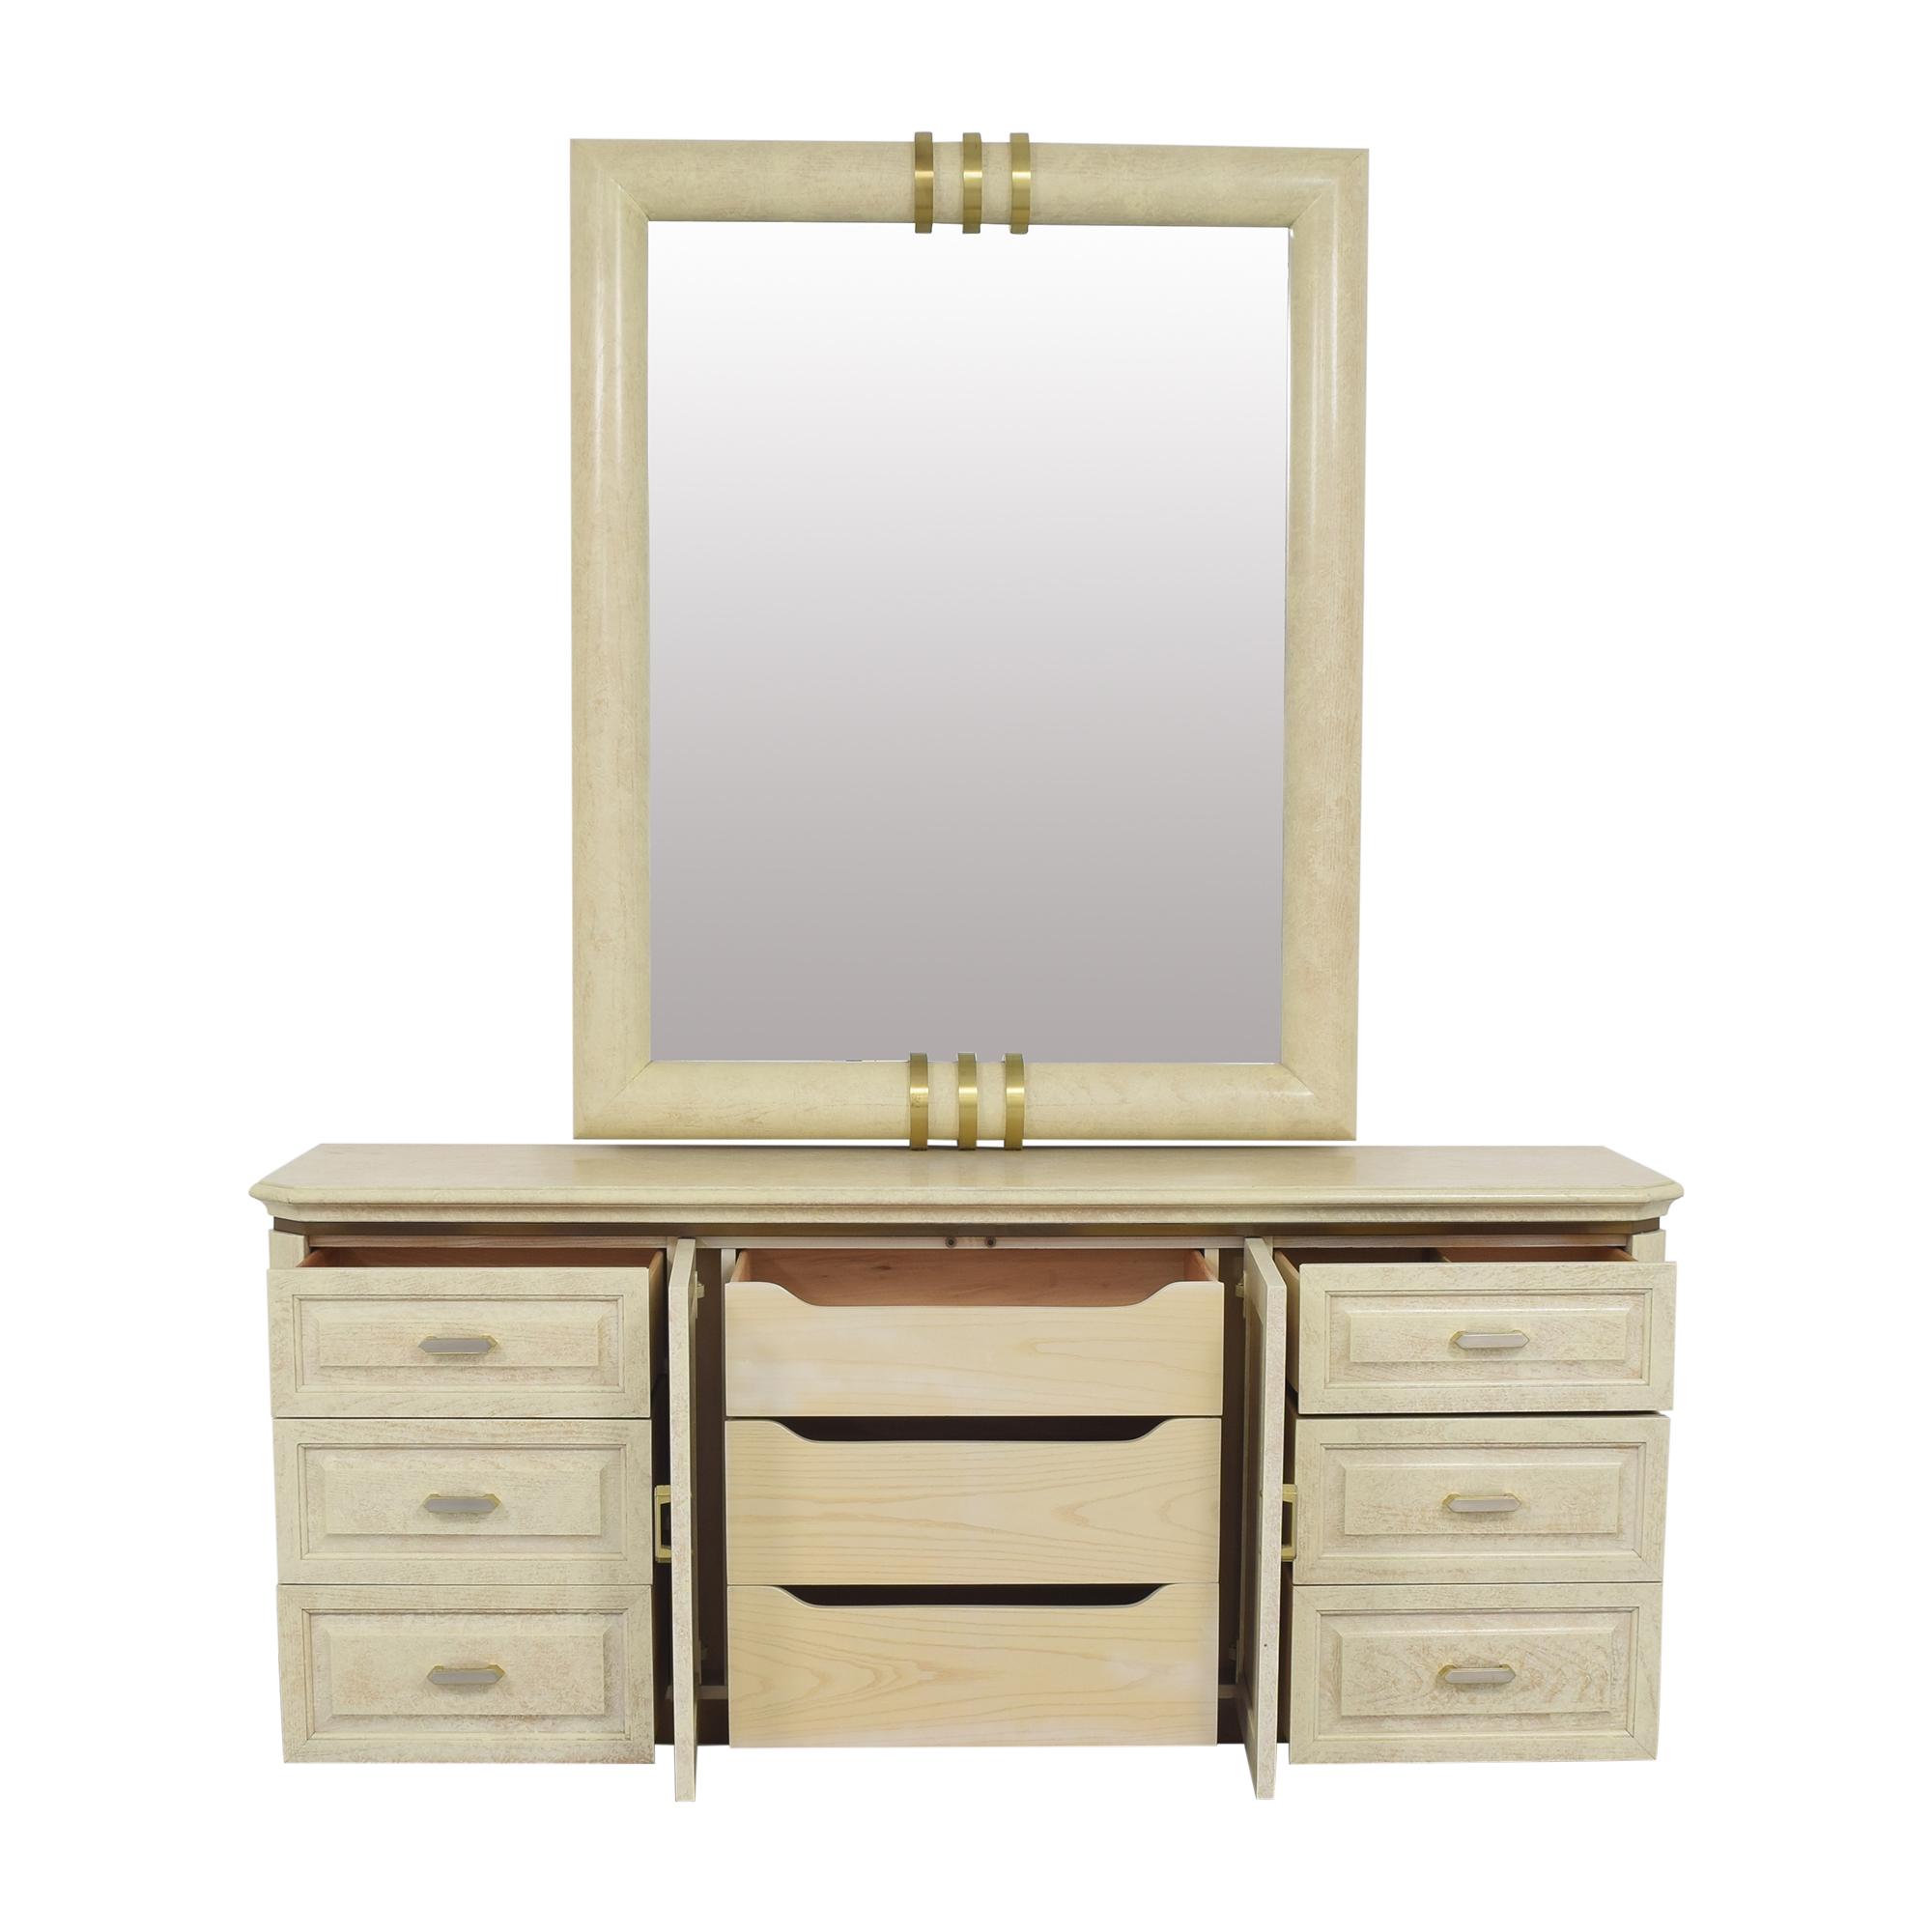 Henredon Furniture Henredon Art Deco Style Dresser and Mirror ct